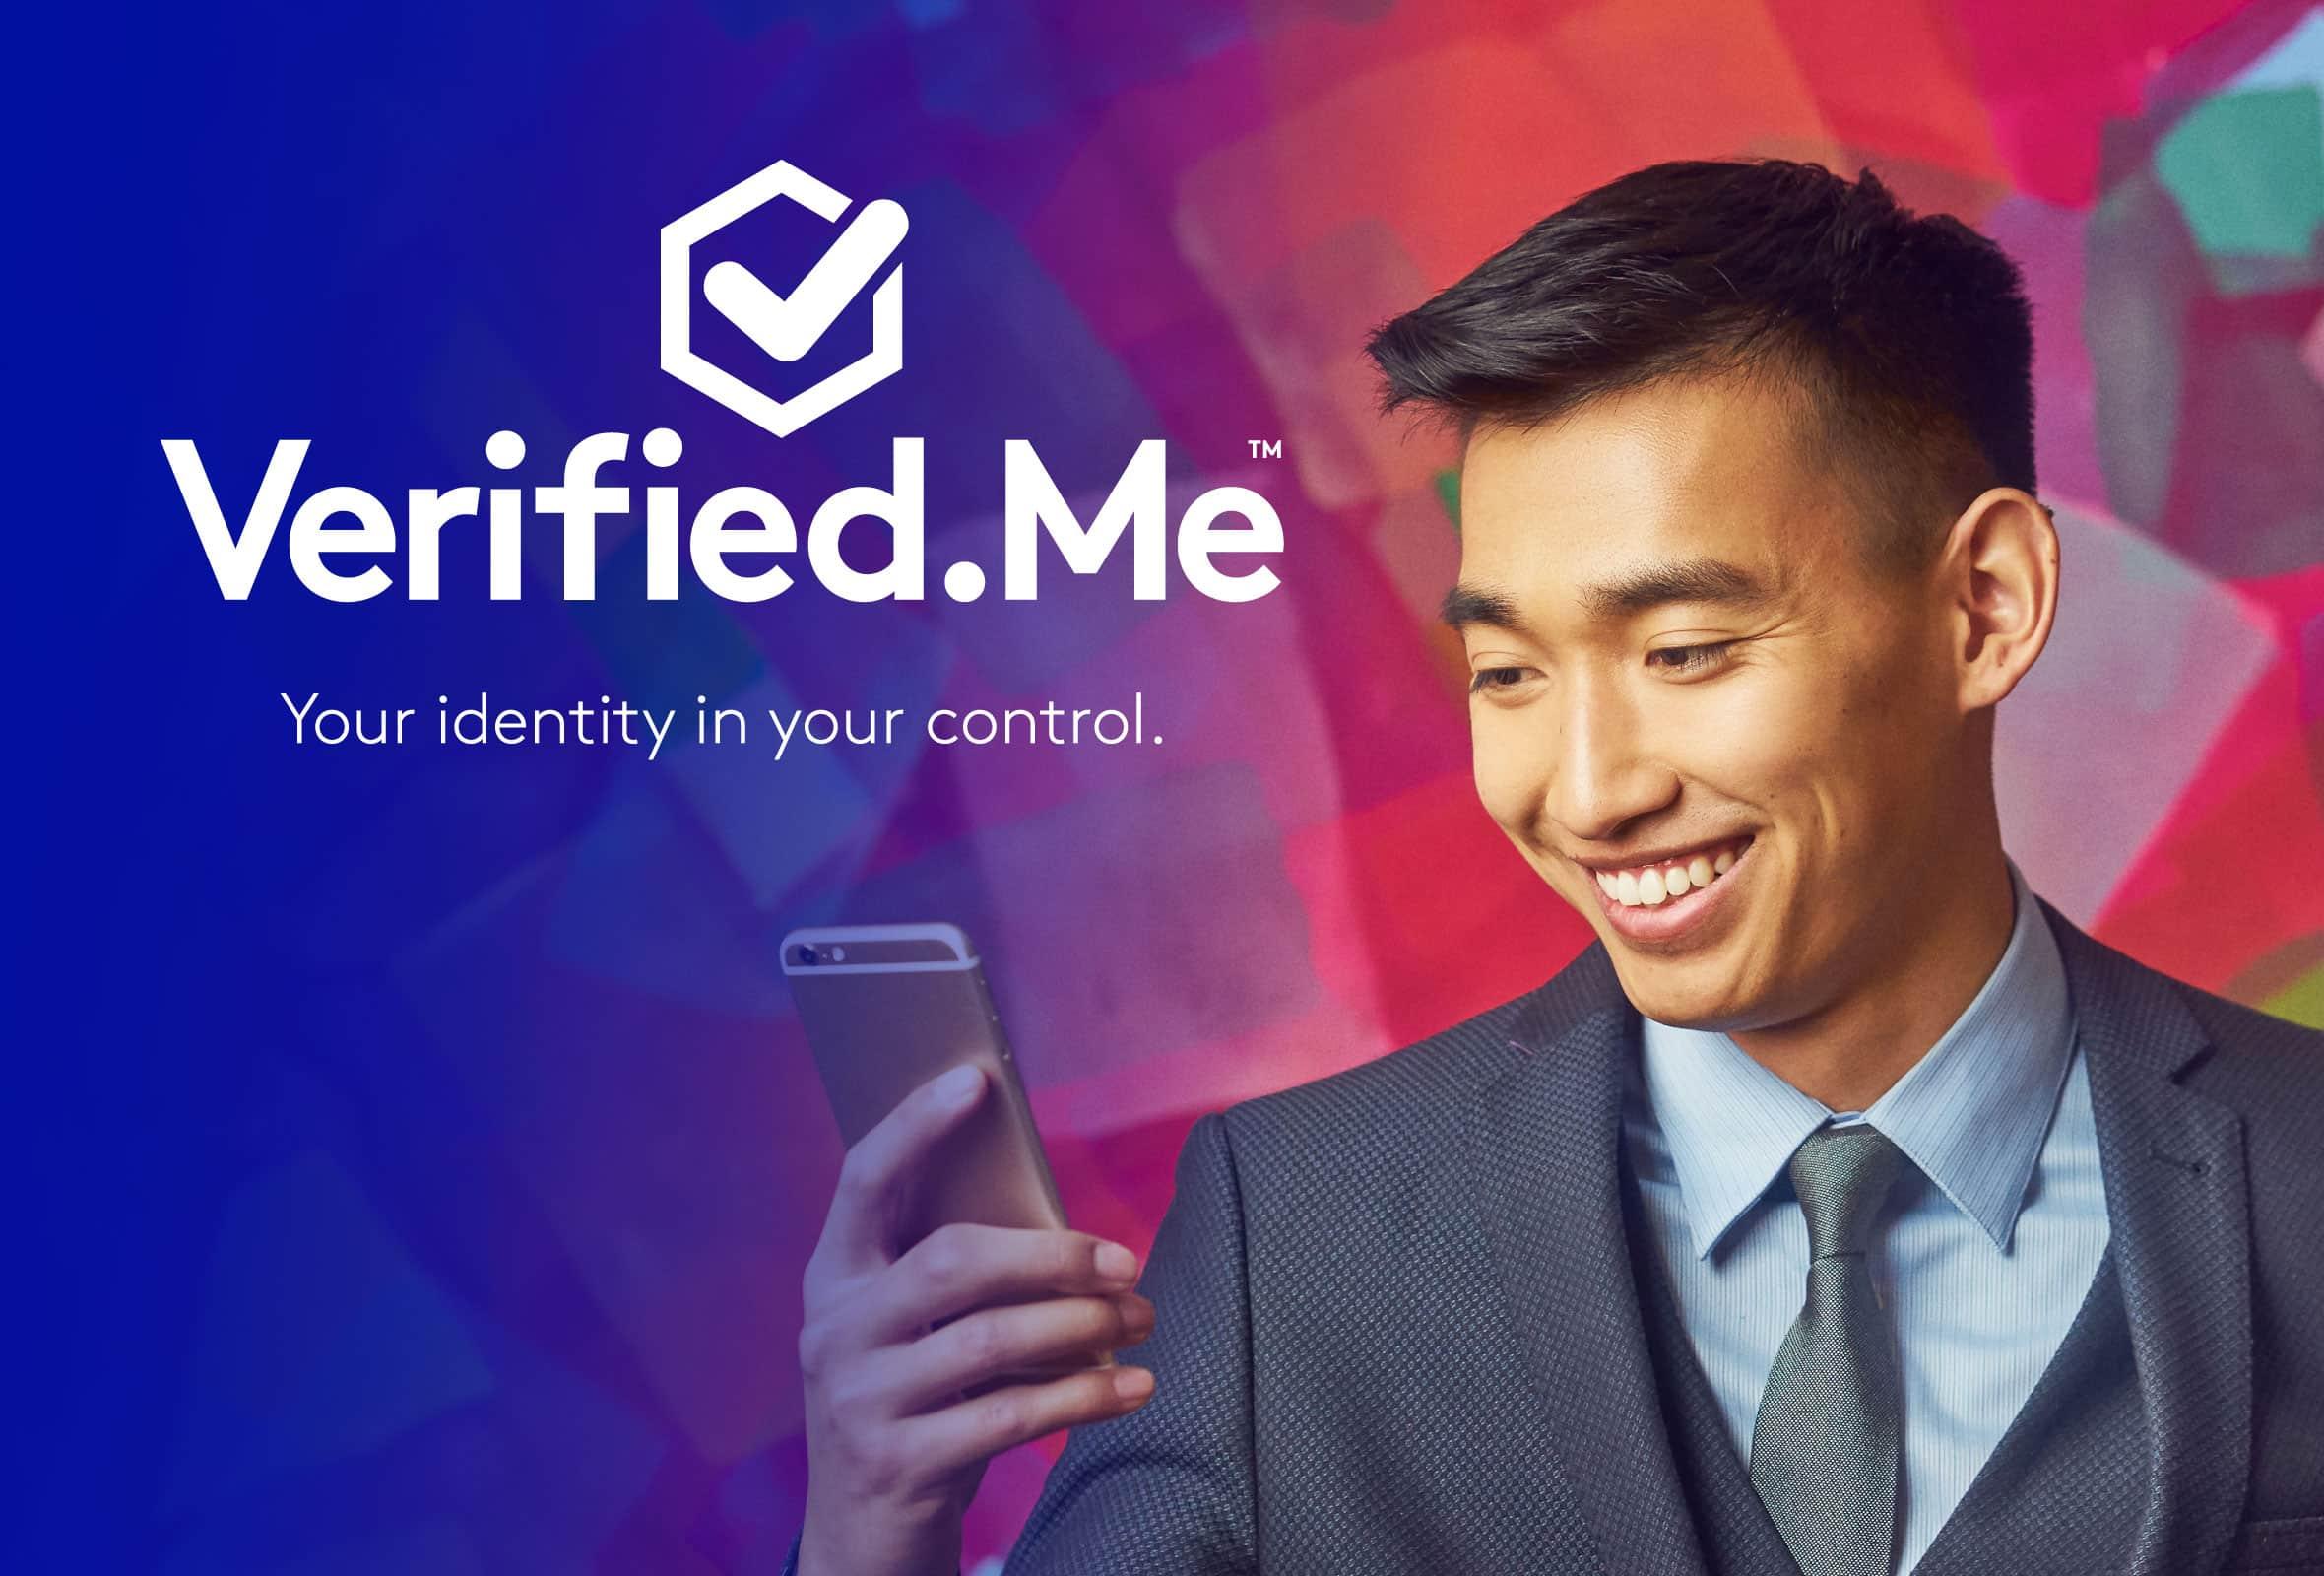 Verified.Me | Brand Identity, Website + Marketing Launch